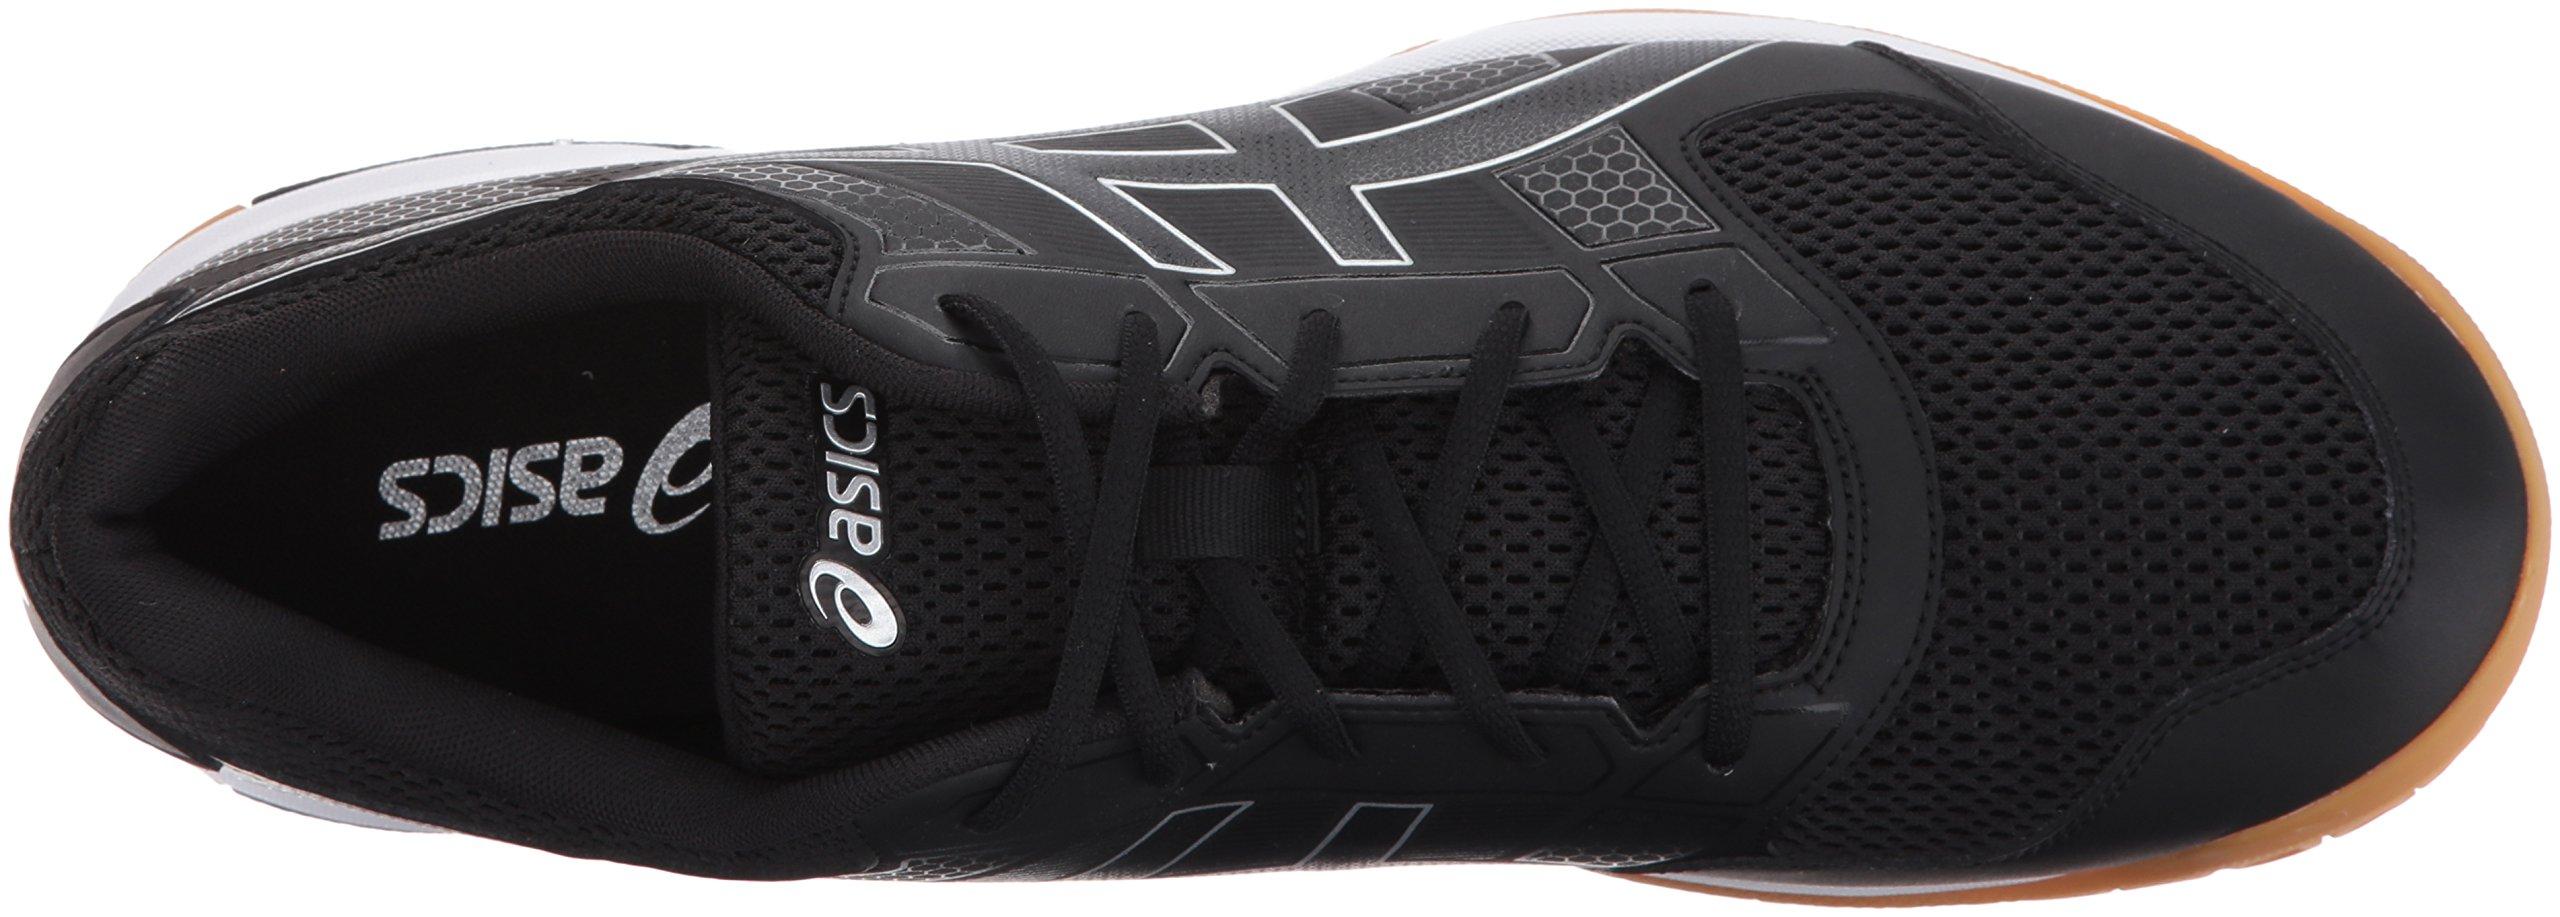 ASICS Mens Gel-Rocket 8 Volleyball Shoe Black/White, 7 Medium US by ASICS (Image #8)